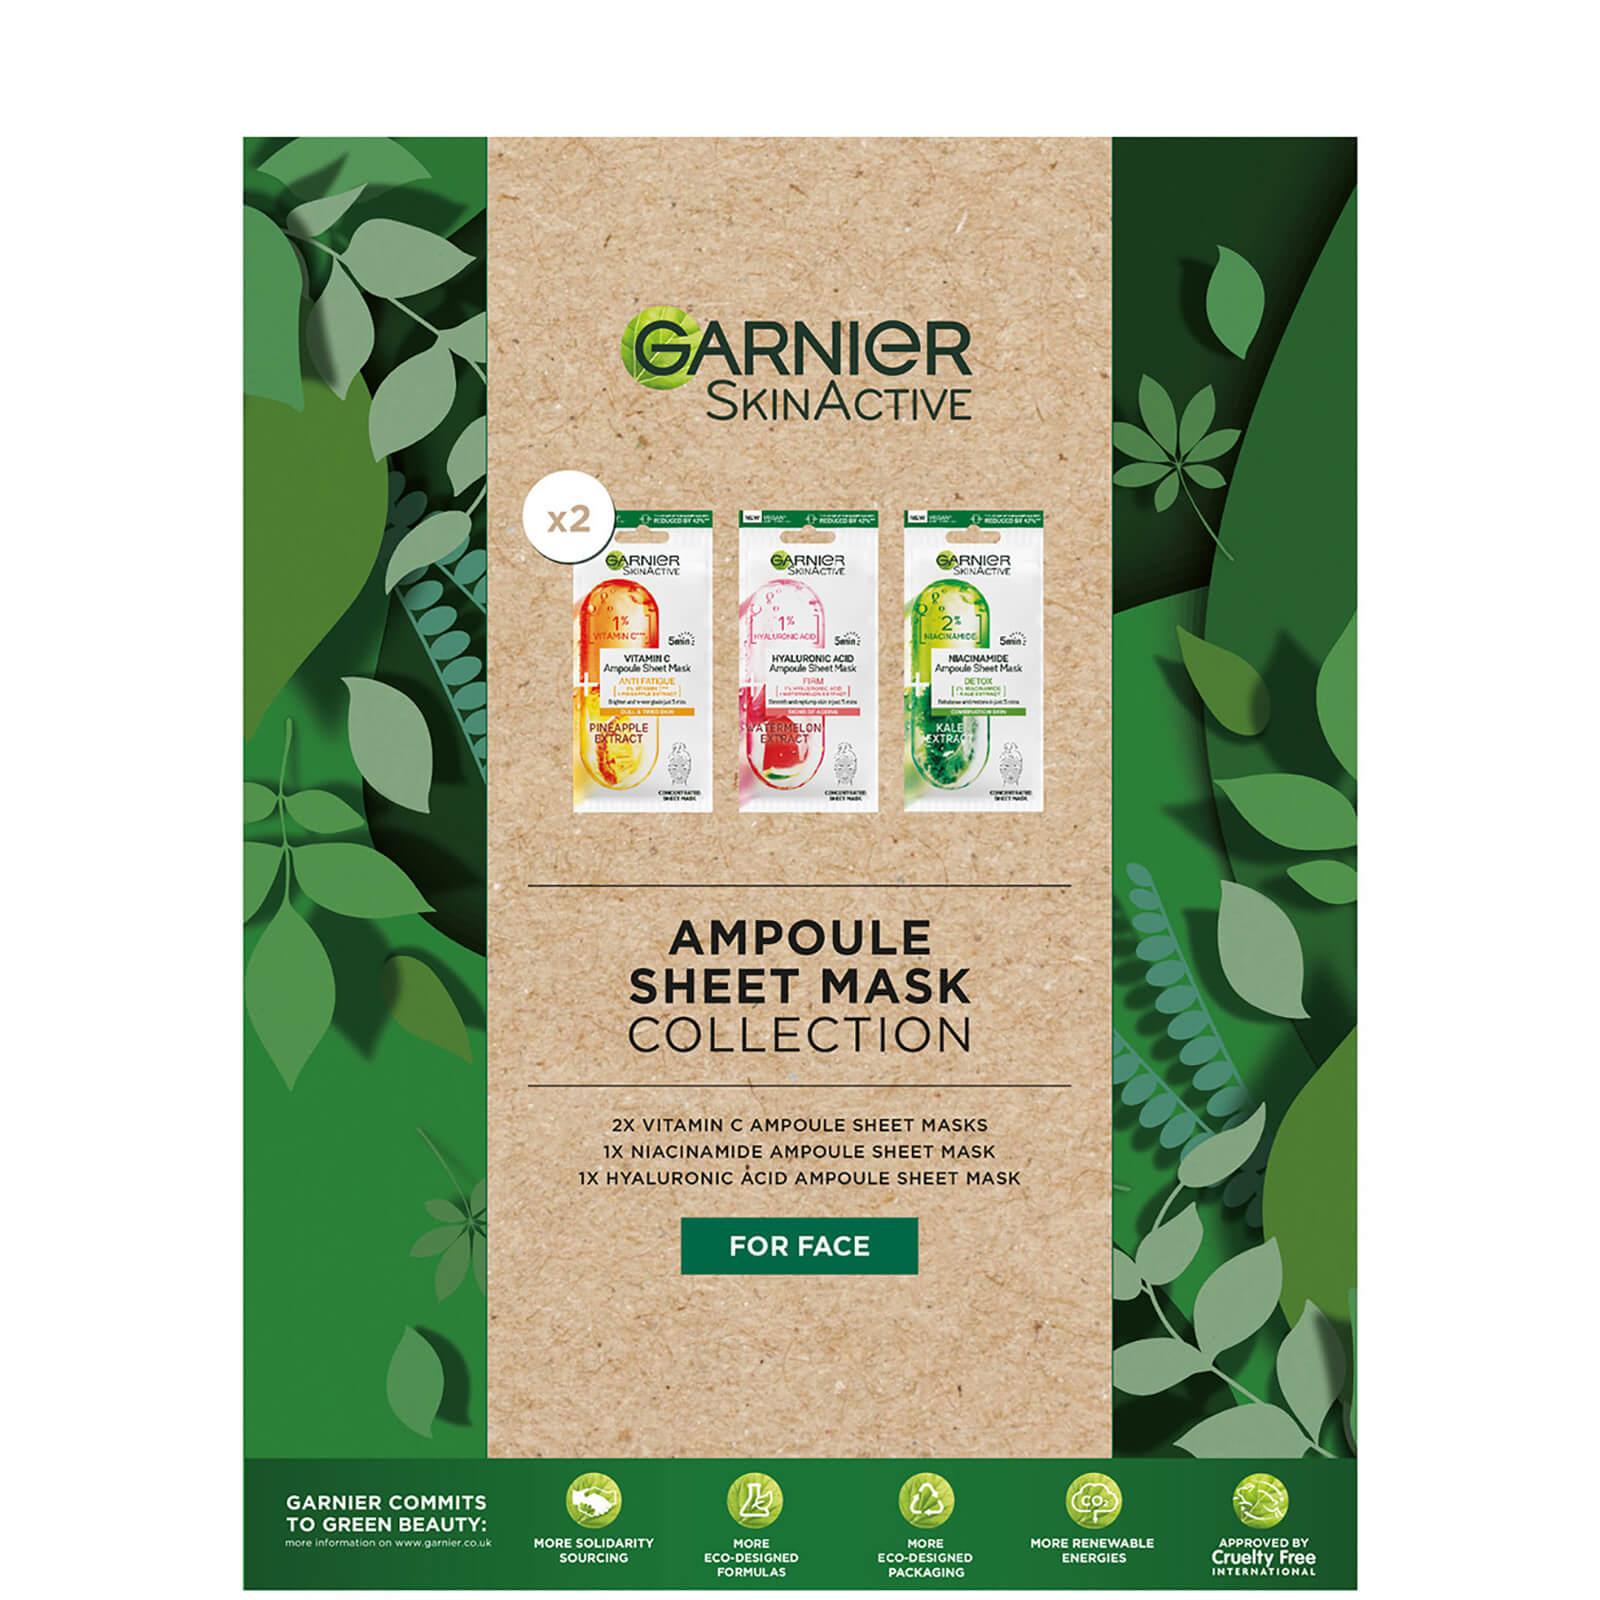 Garnier Ampoule Sheet Mask Collection